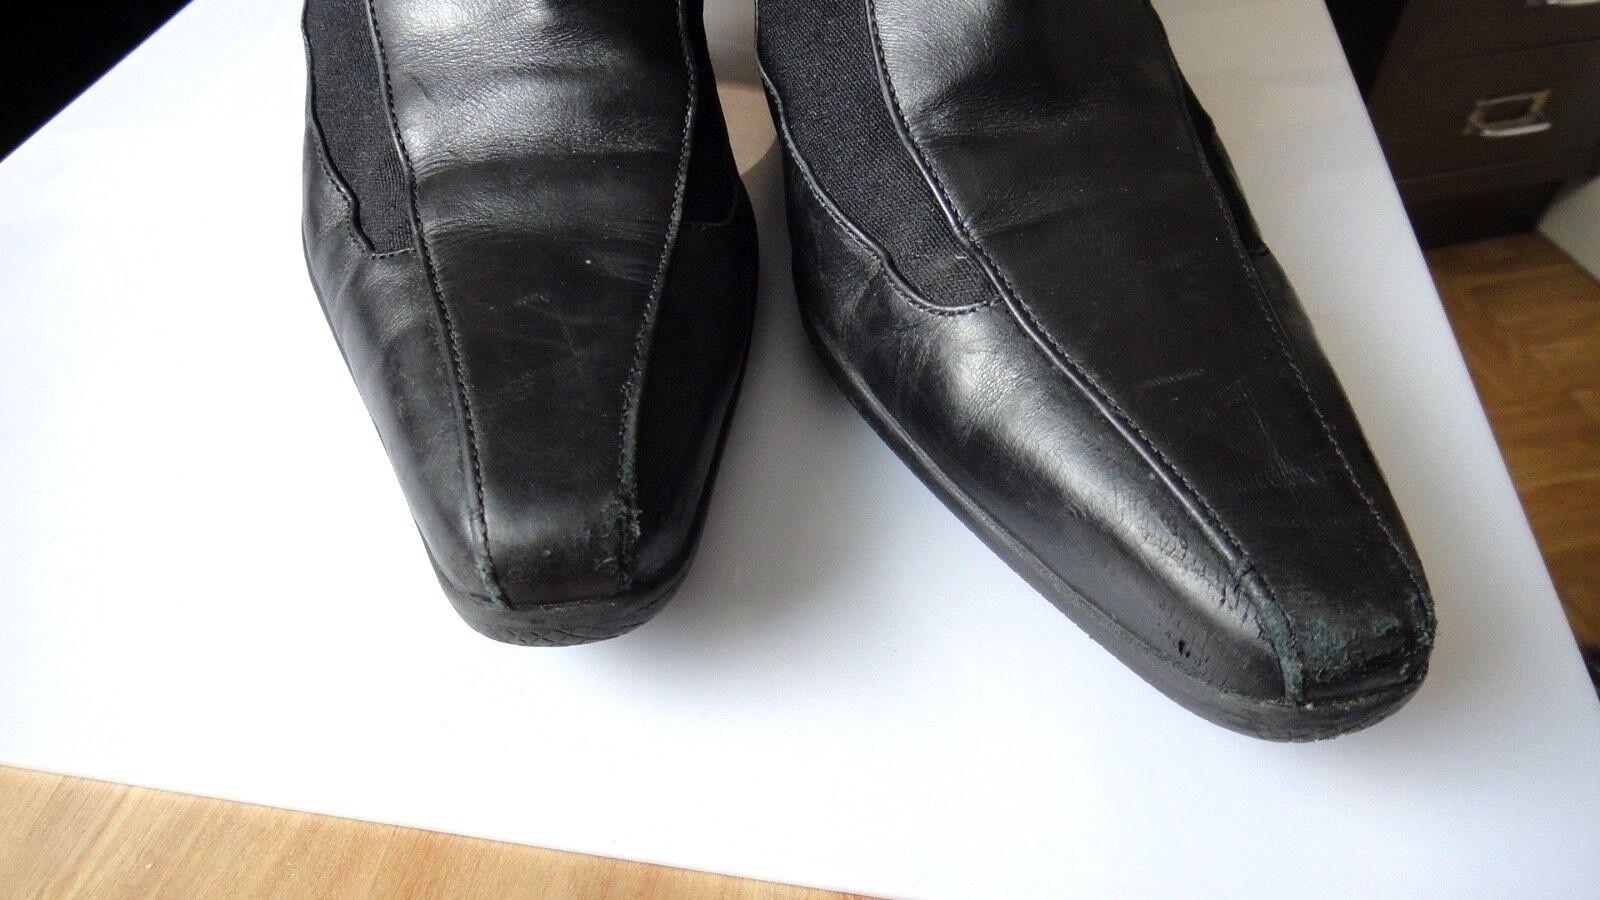 Original PRADA STIEFEL BOOTS Schuhe 37,5 schwarz black Shoes Gr. 37,5 Schuhe designer 8b6086